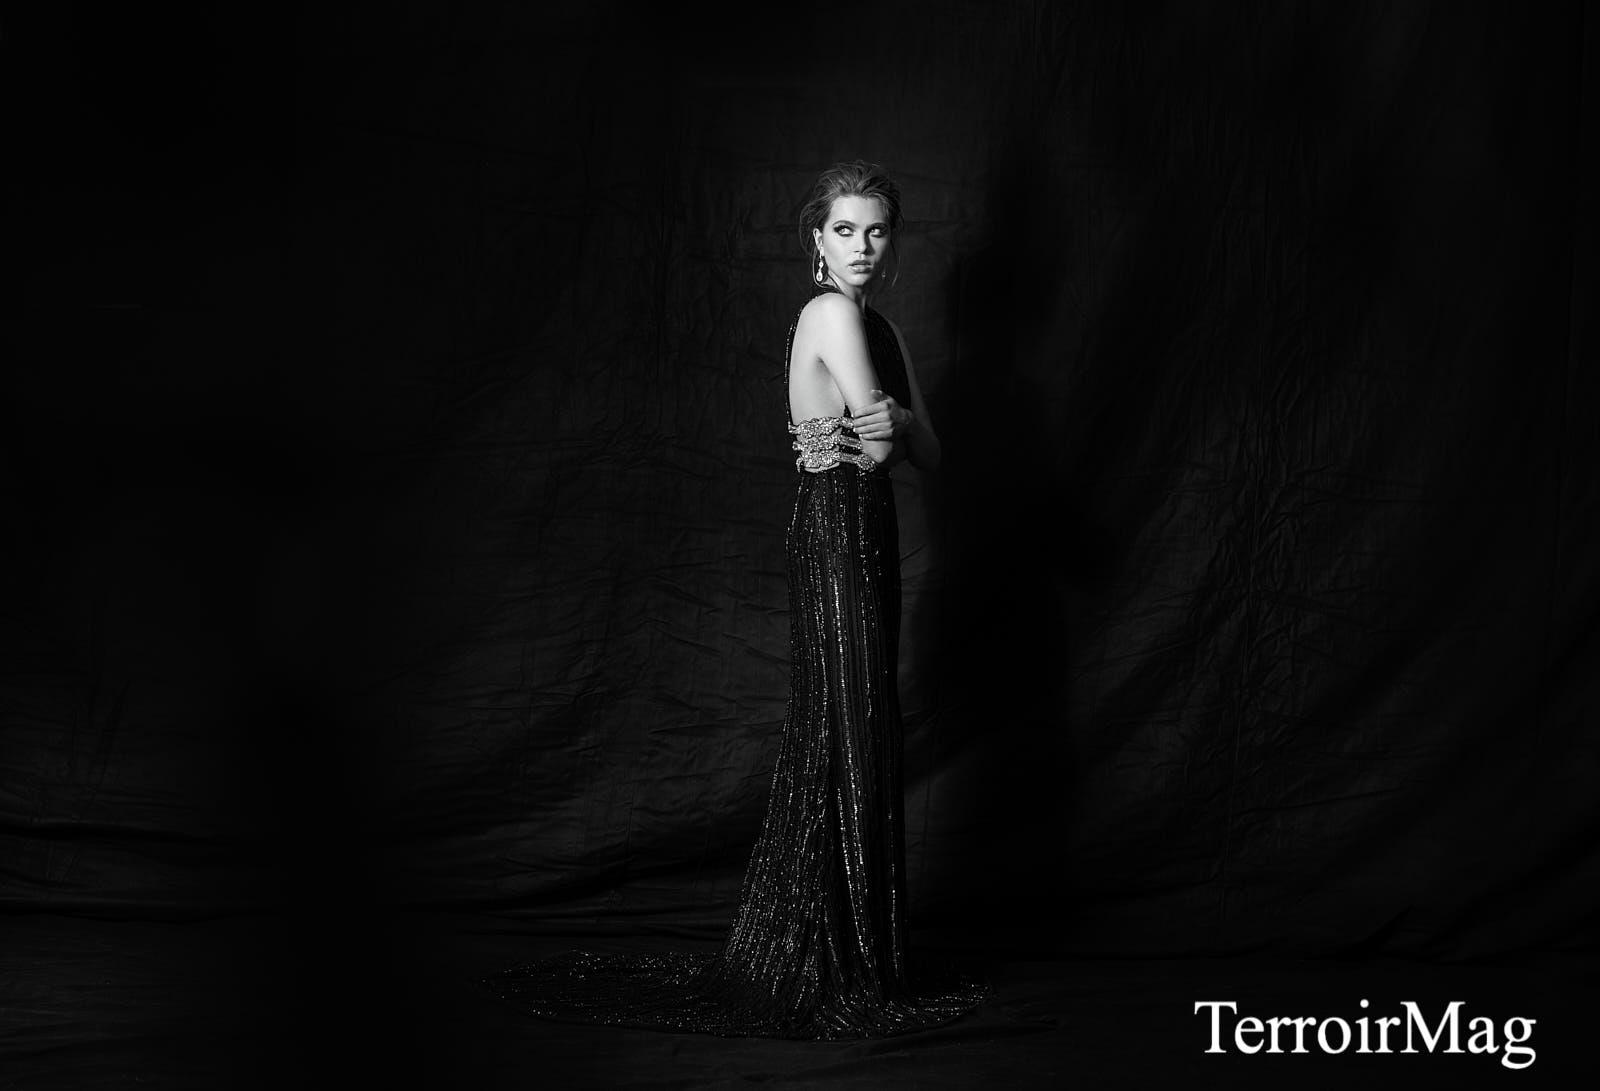 Photographer  Remy Tortosa